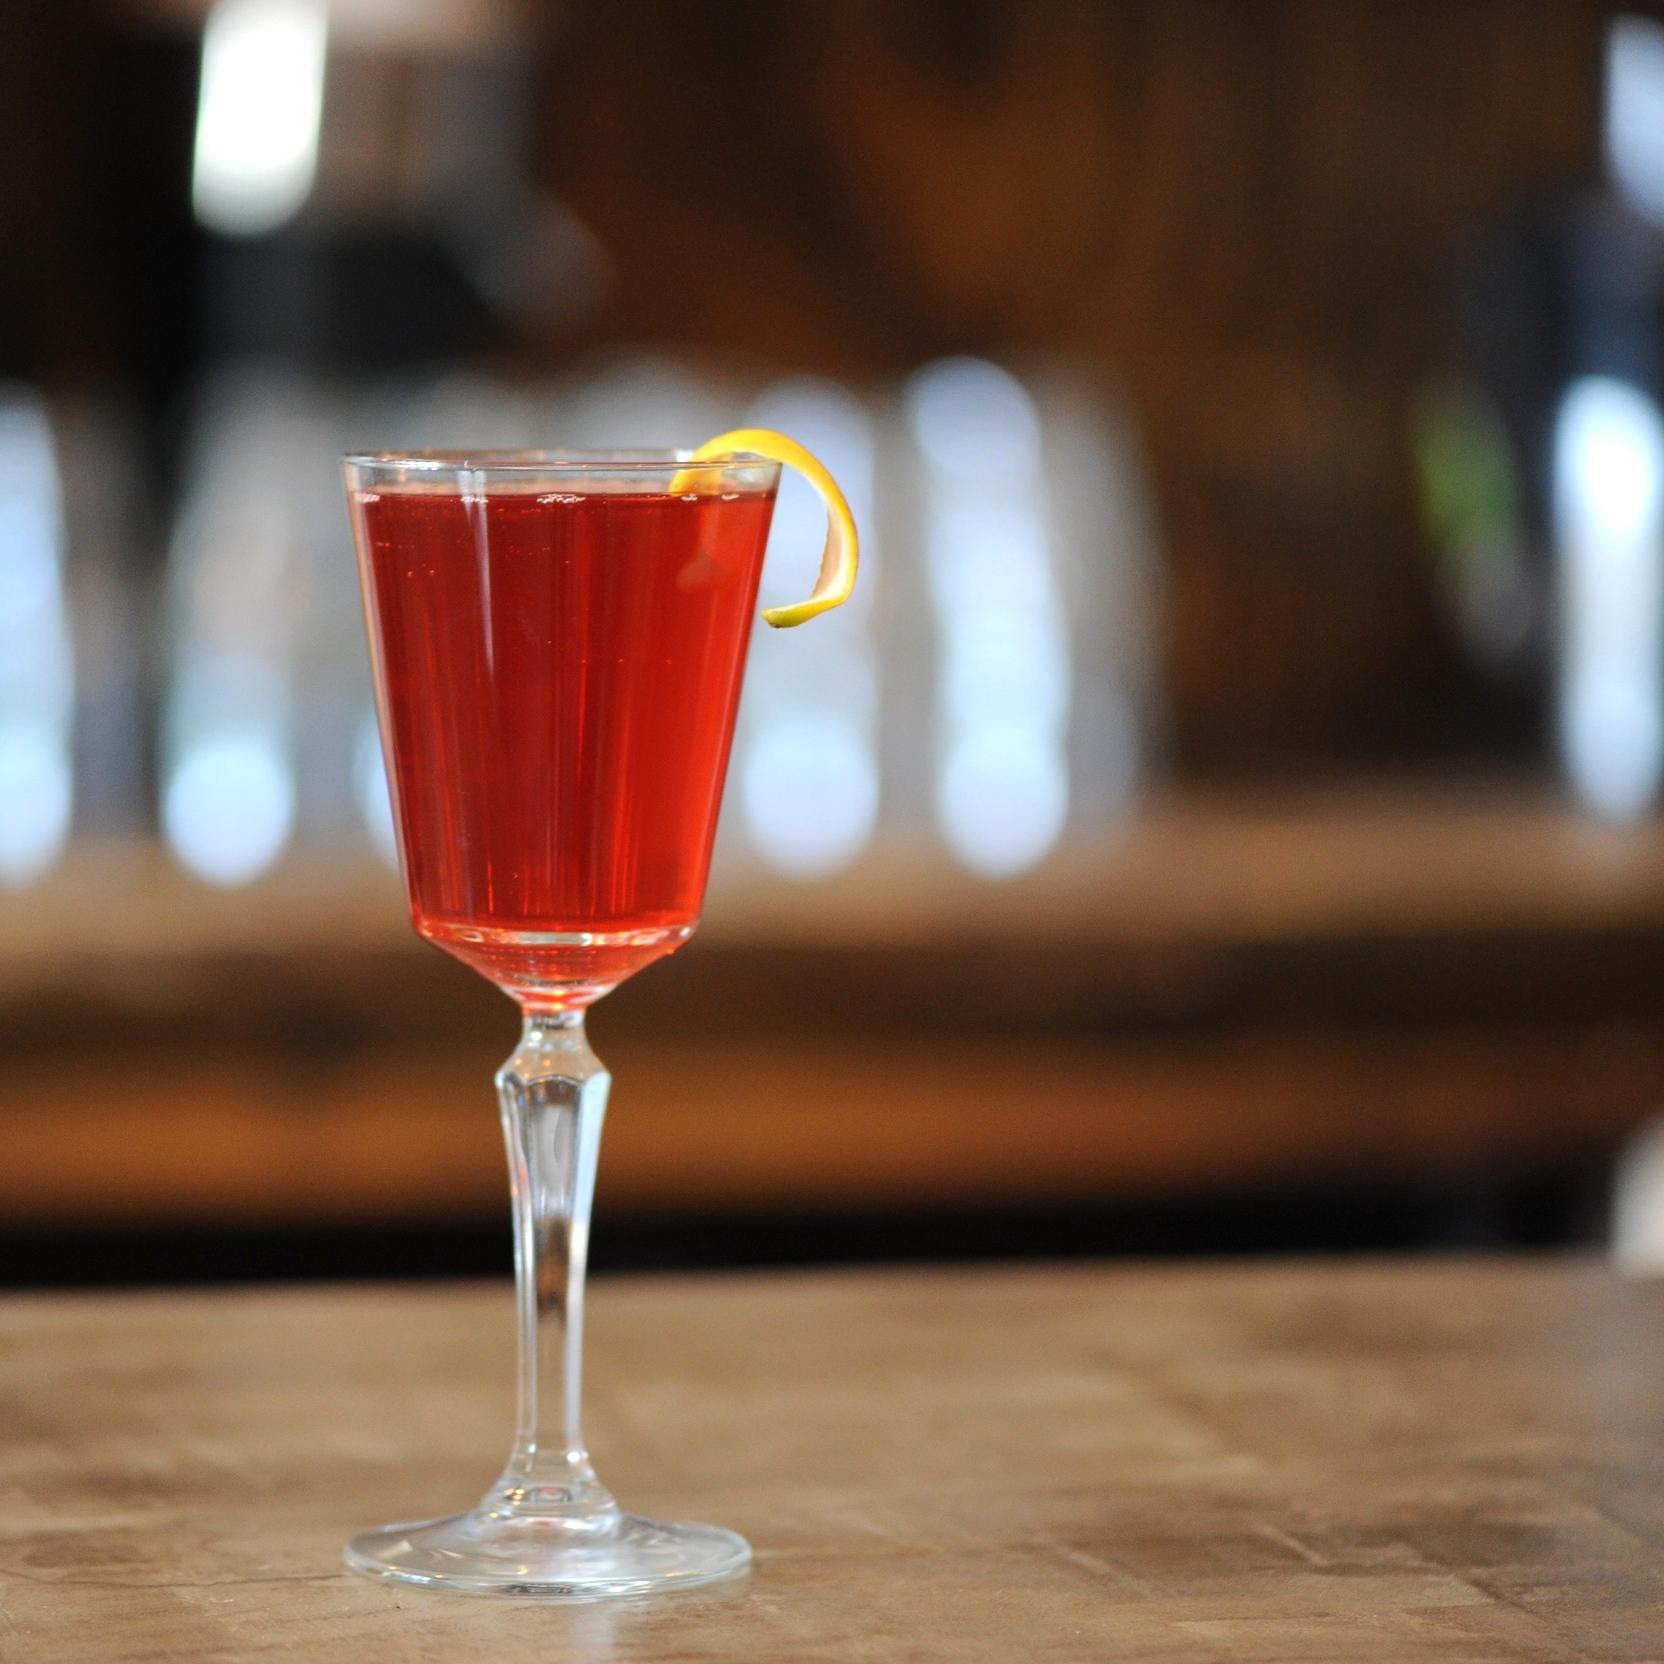 the-cocktail-experiment-syrups-chocolate-malt-jockey